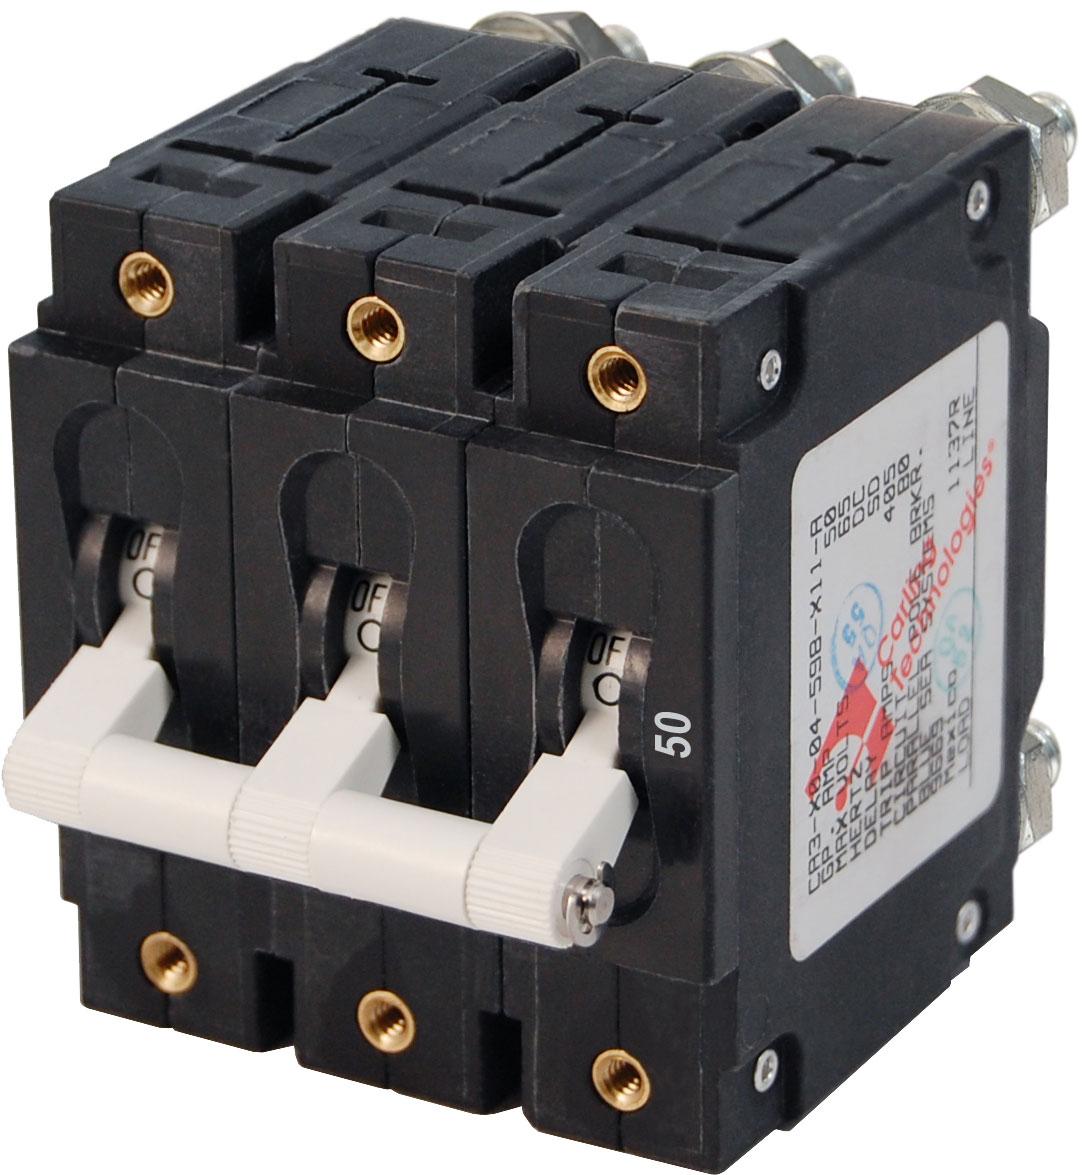 C-Series White Toggle Circuit Breaker - Triple Pole 50 Amp - Blue ...